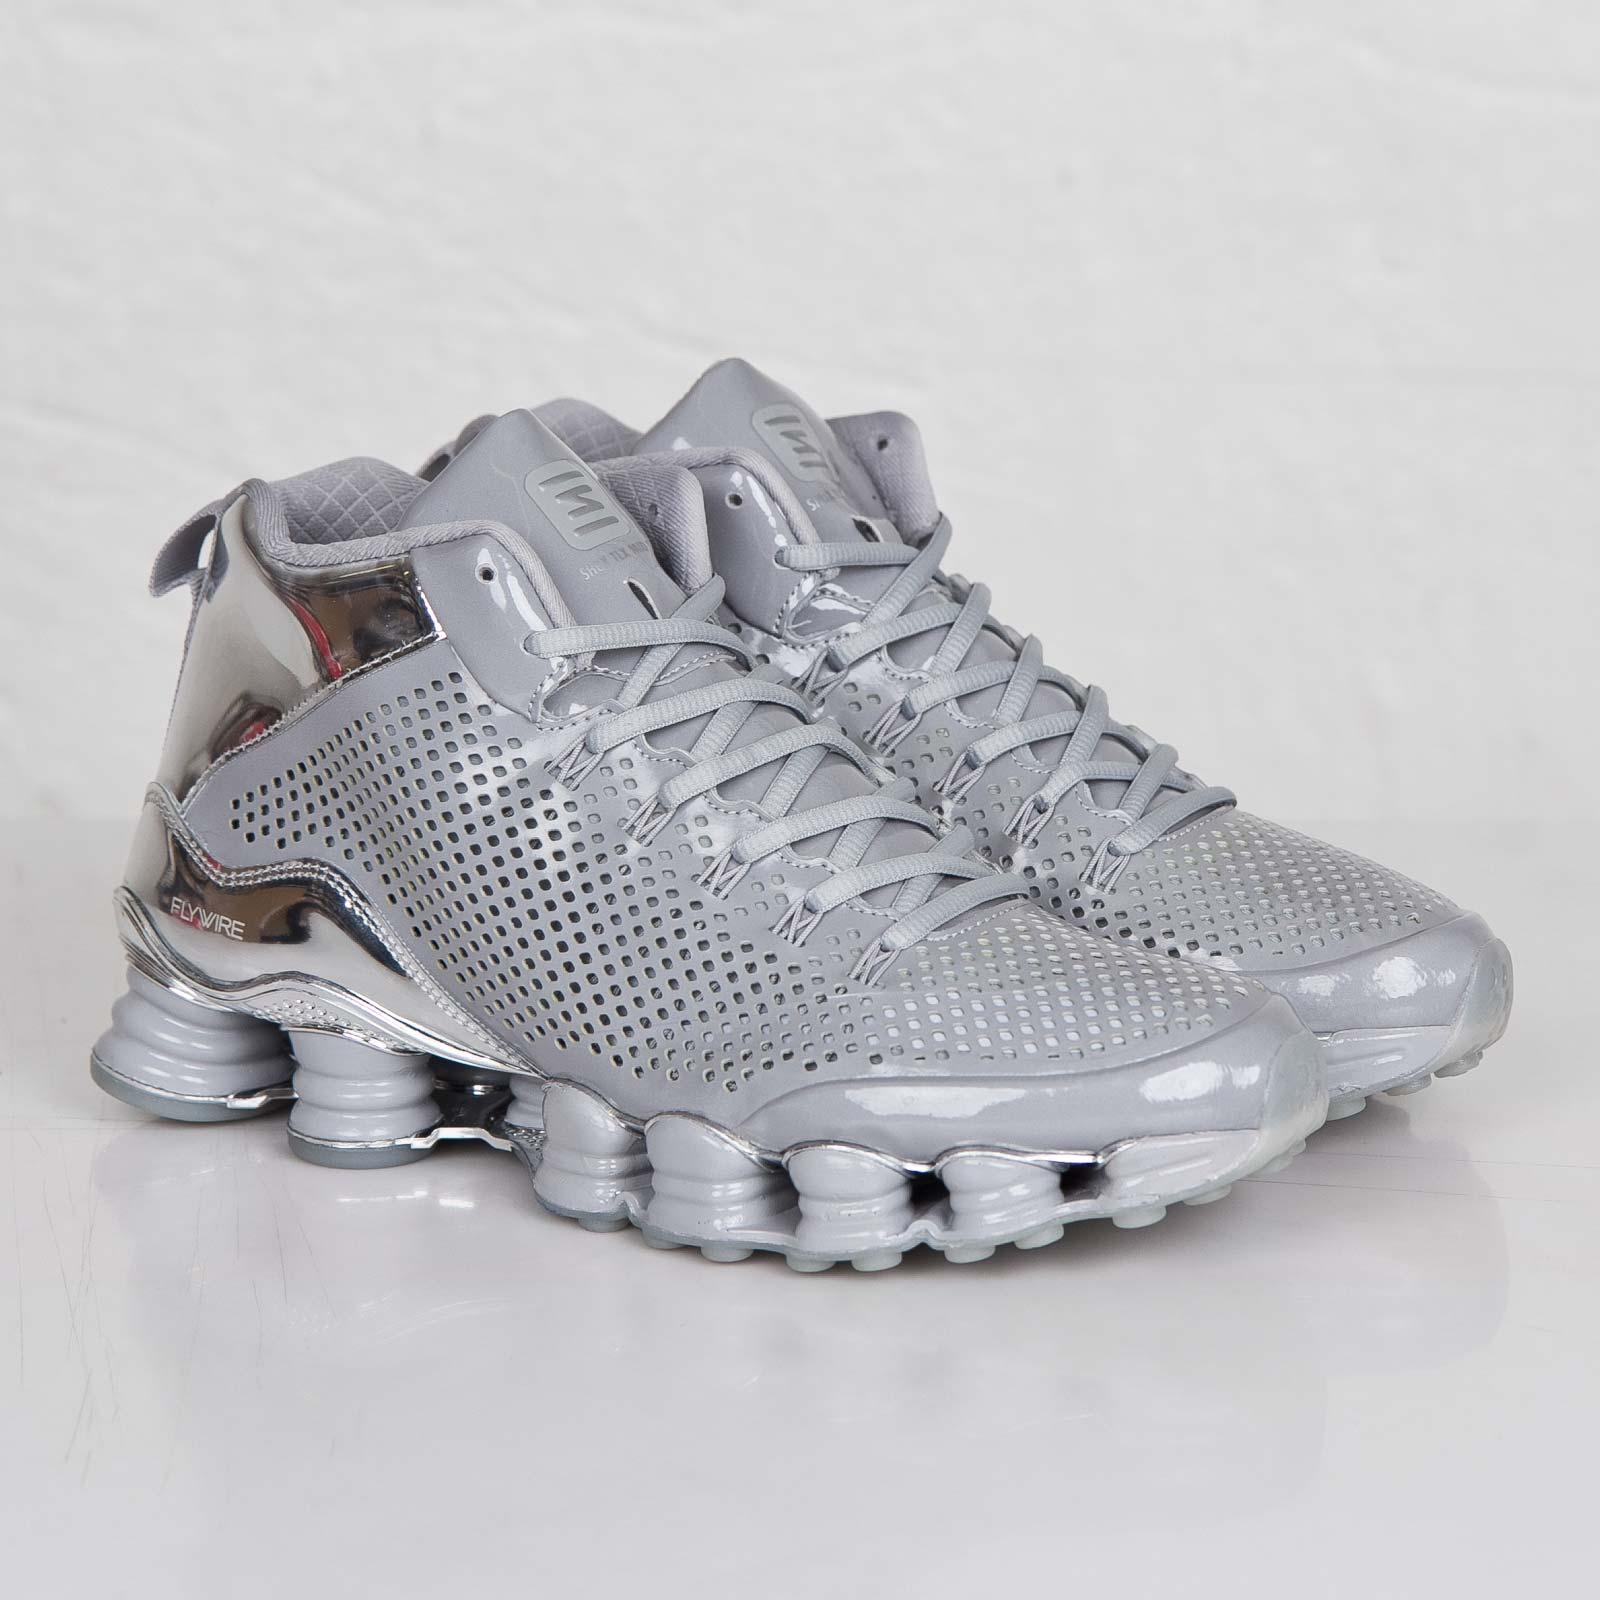 Nike Shox TLX Mid SP - 677737-003